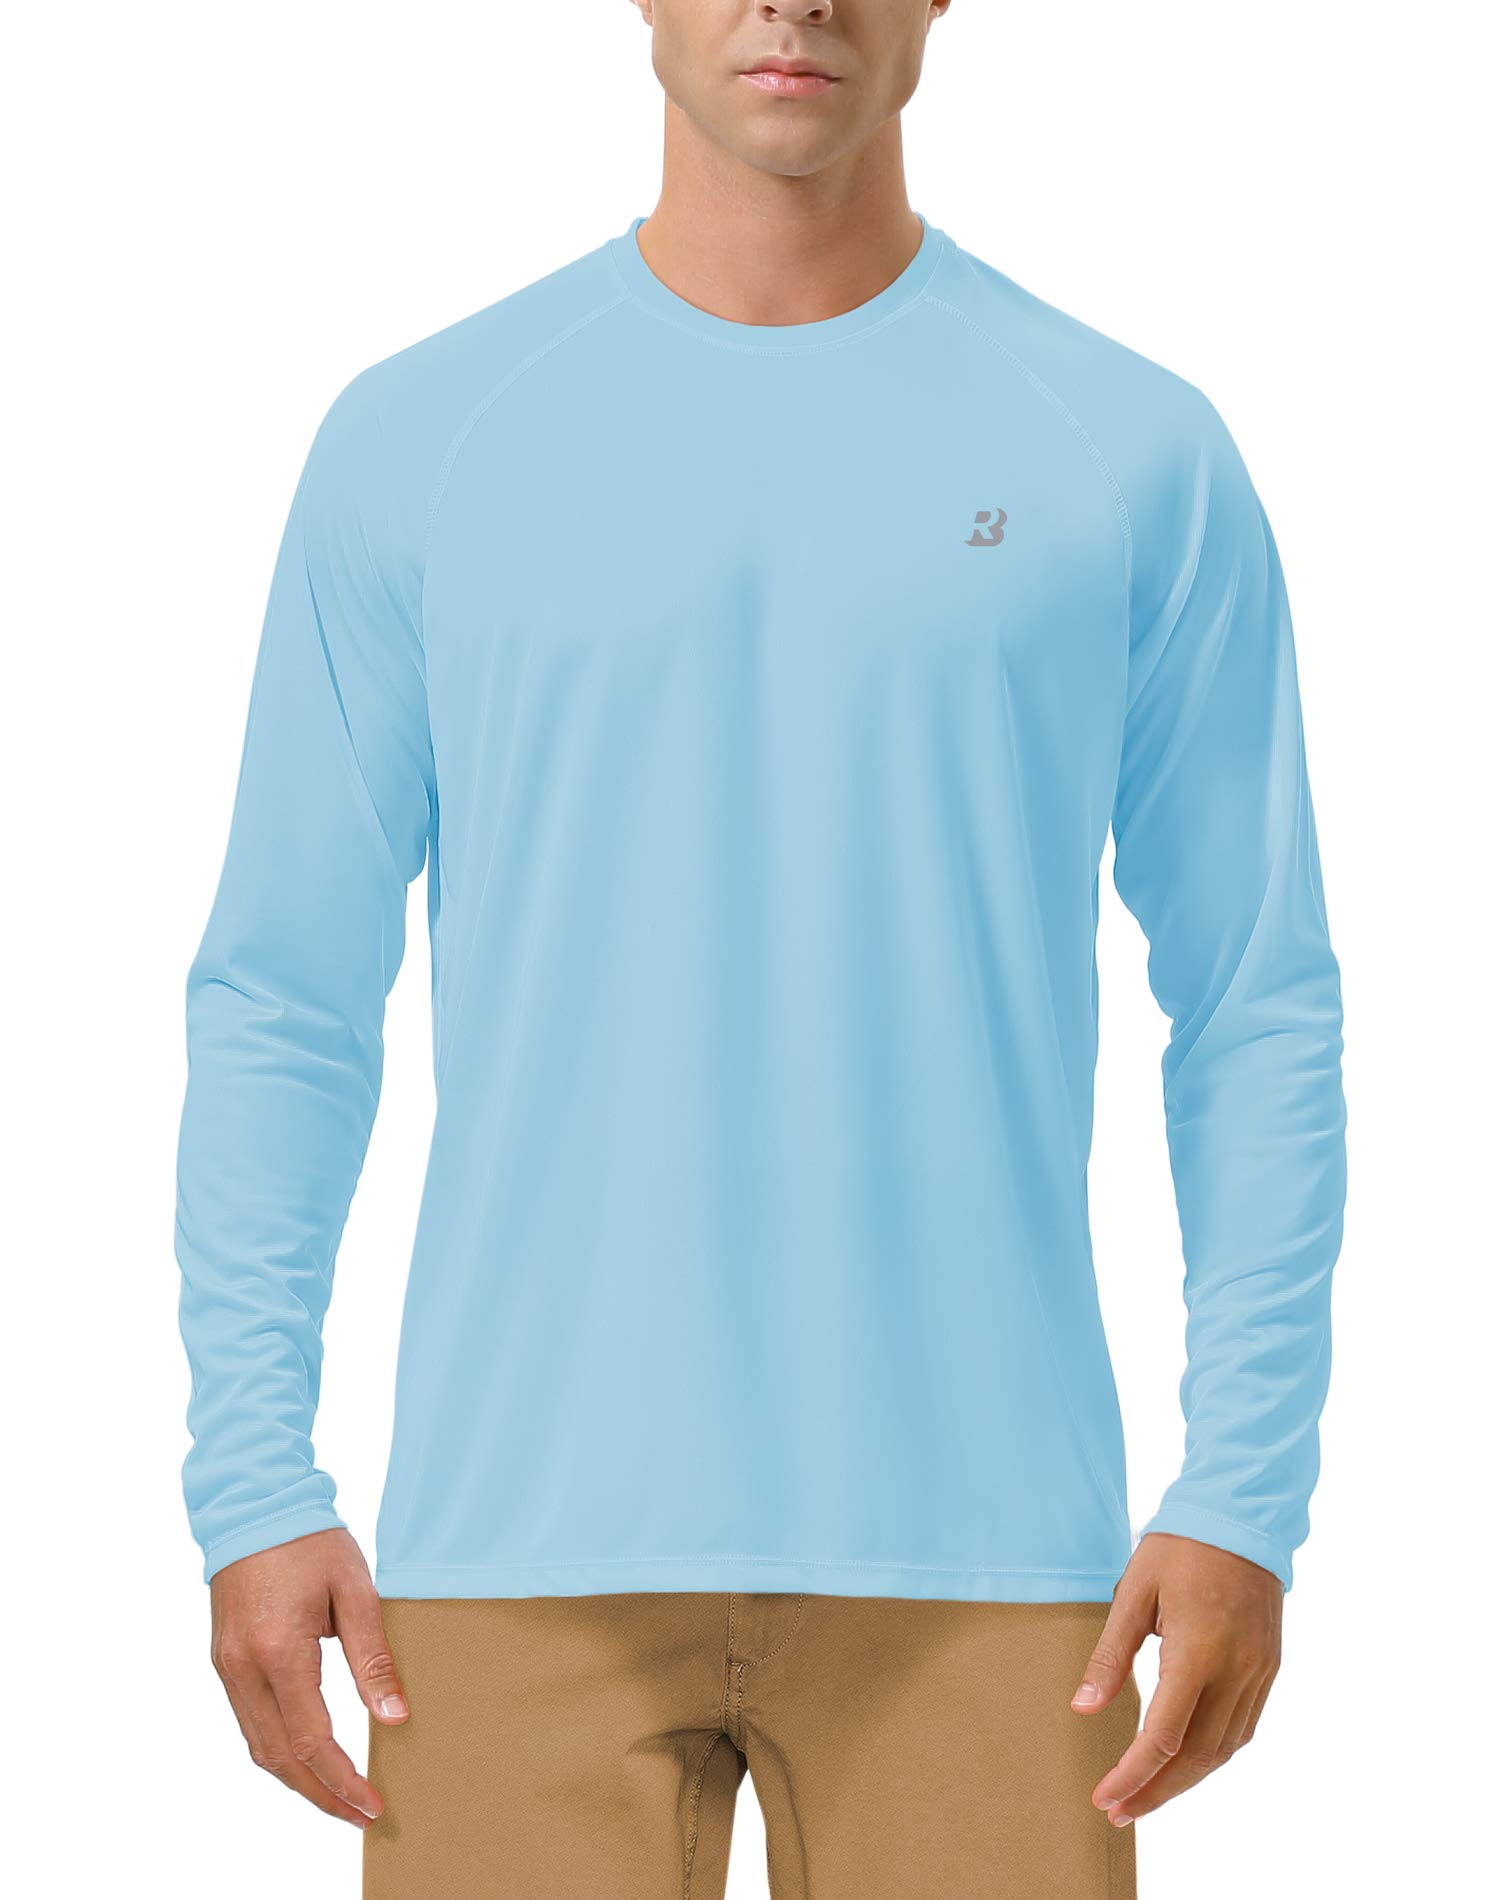 Roadbox Men's Sun Protection UPF 50+ UV Outdoor Long Sleeve Dri-fit T-Shirt Rashguard for Running, Fishing, Hiking(Large, Blue) by Roadbox